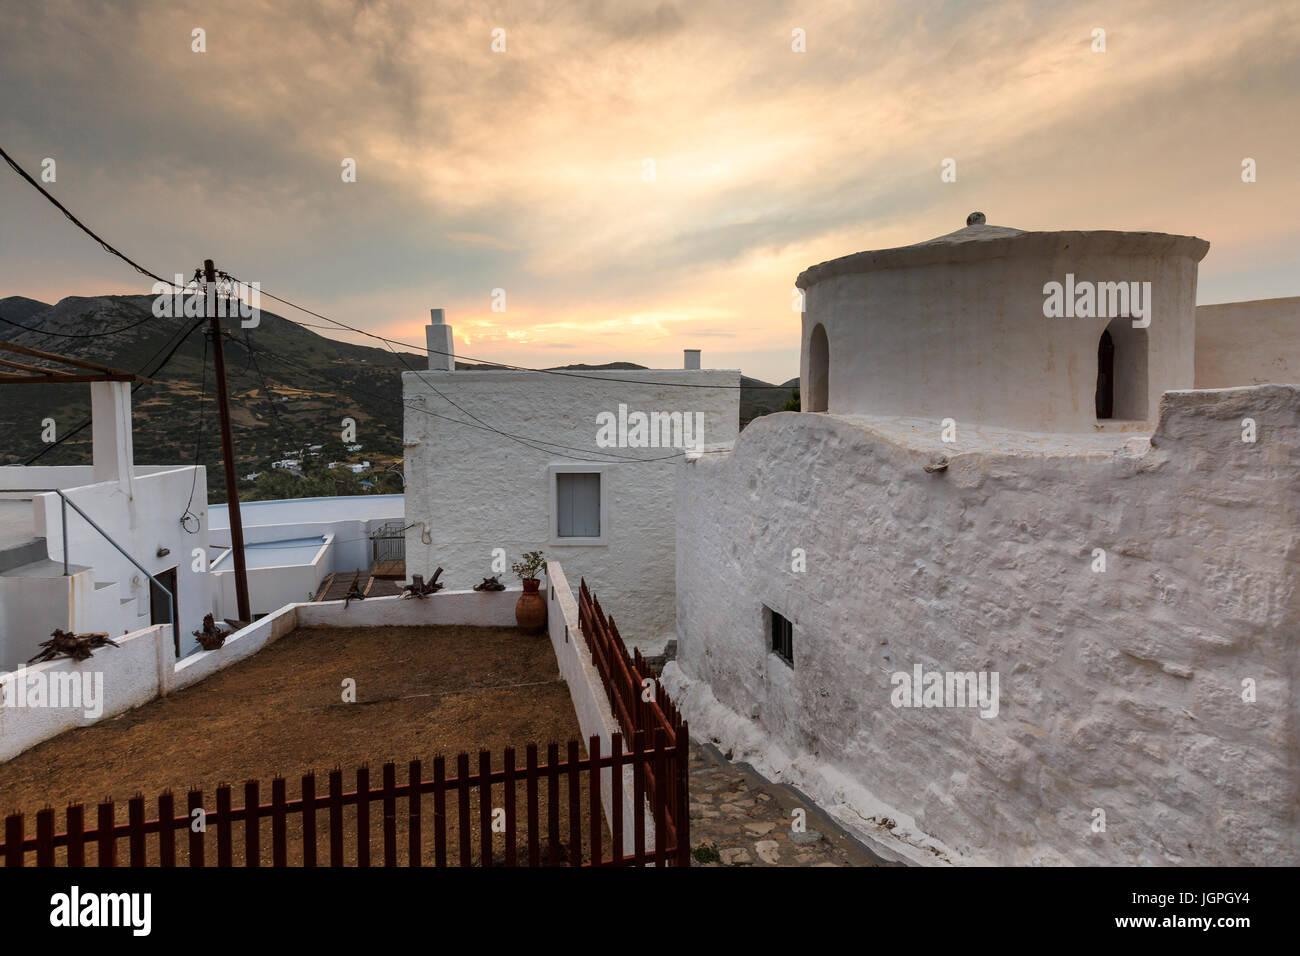 View of Chora village on Skyros island, Greece. - Stock Image